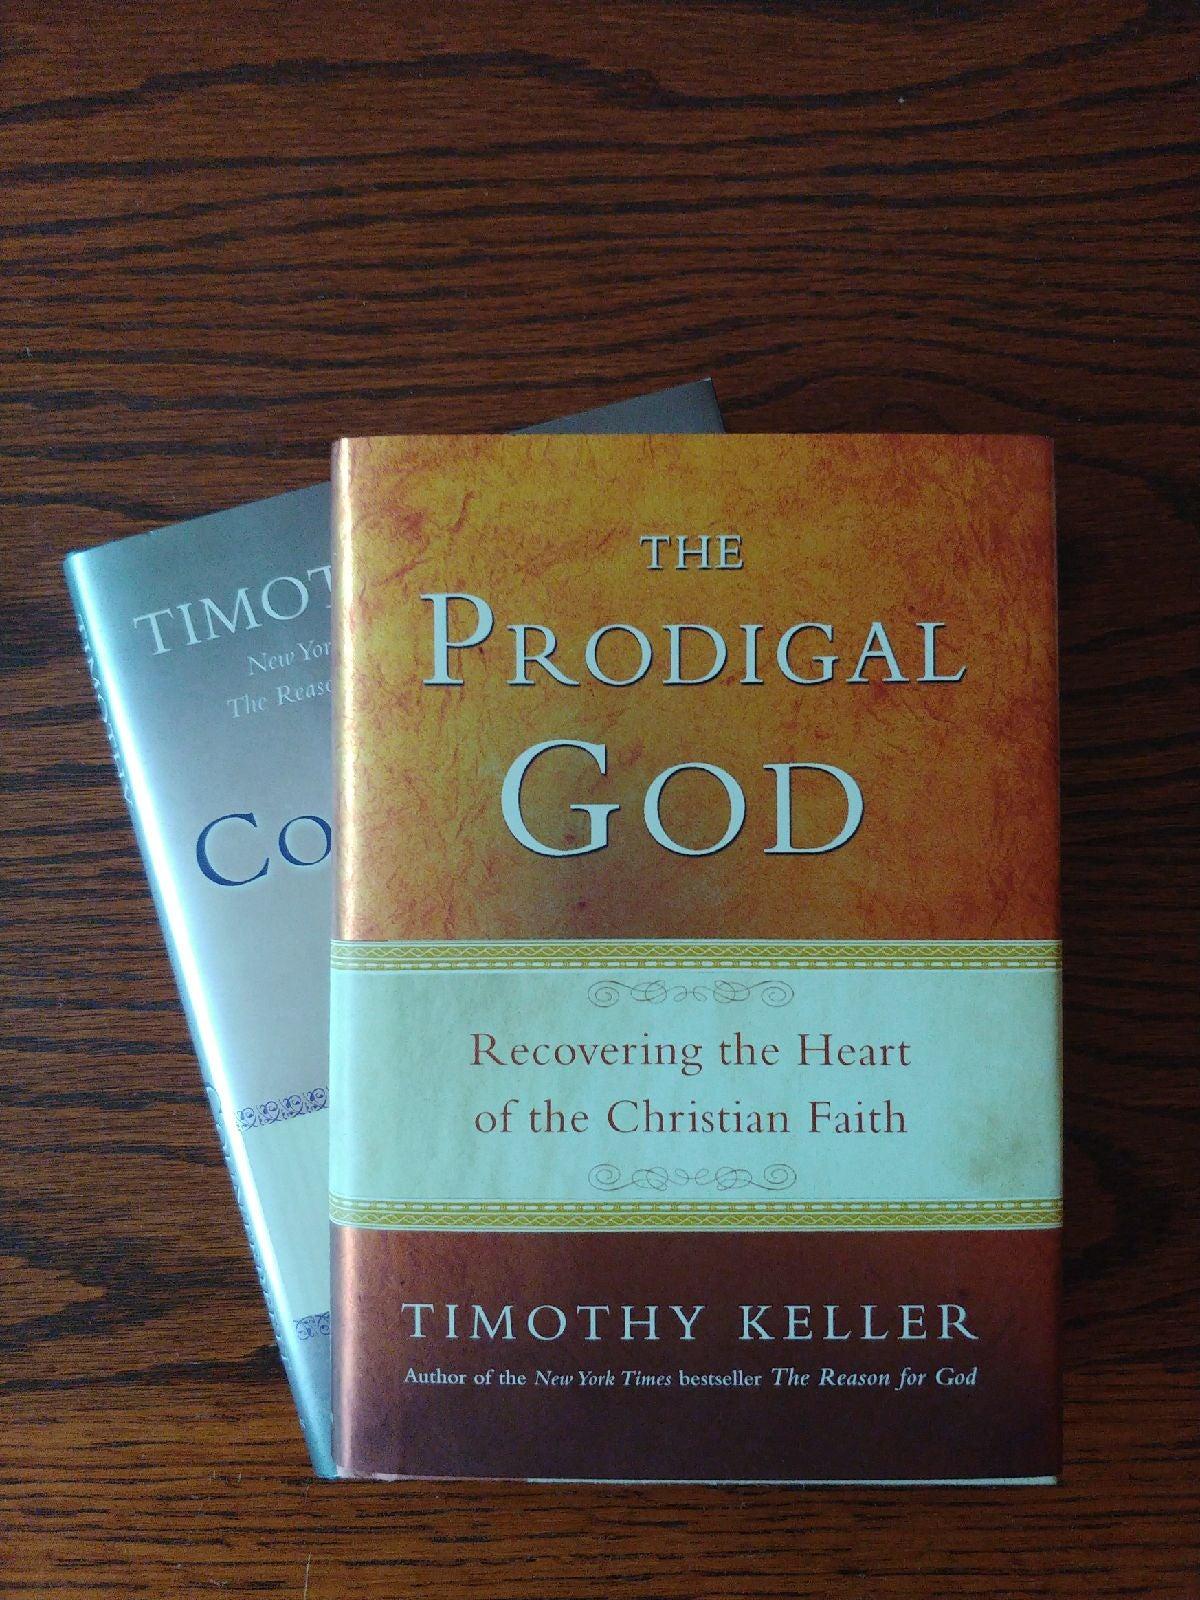 Books by Timothy Keller